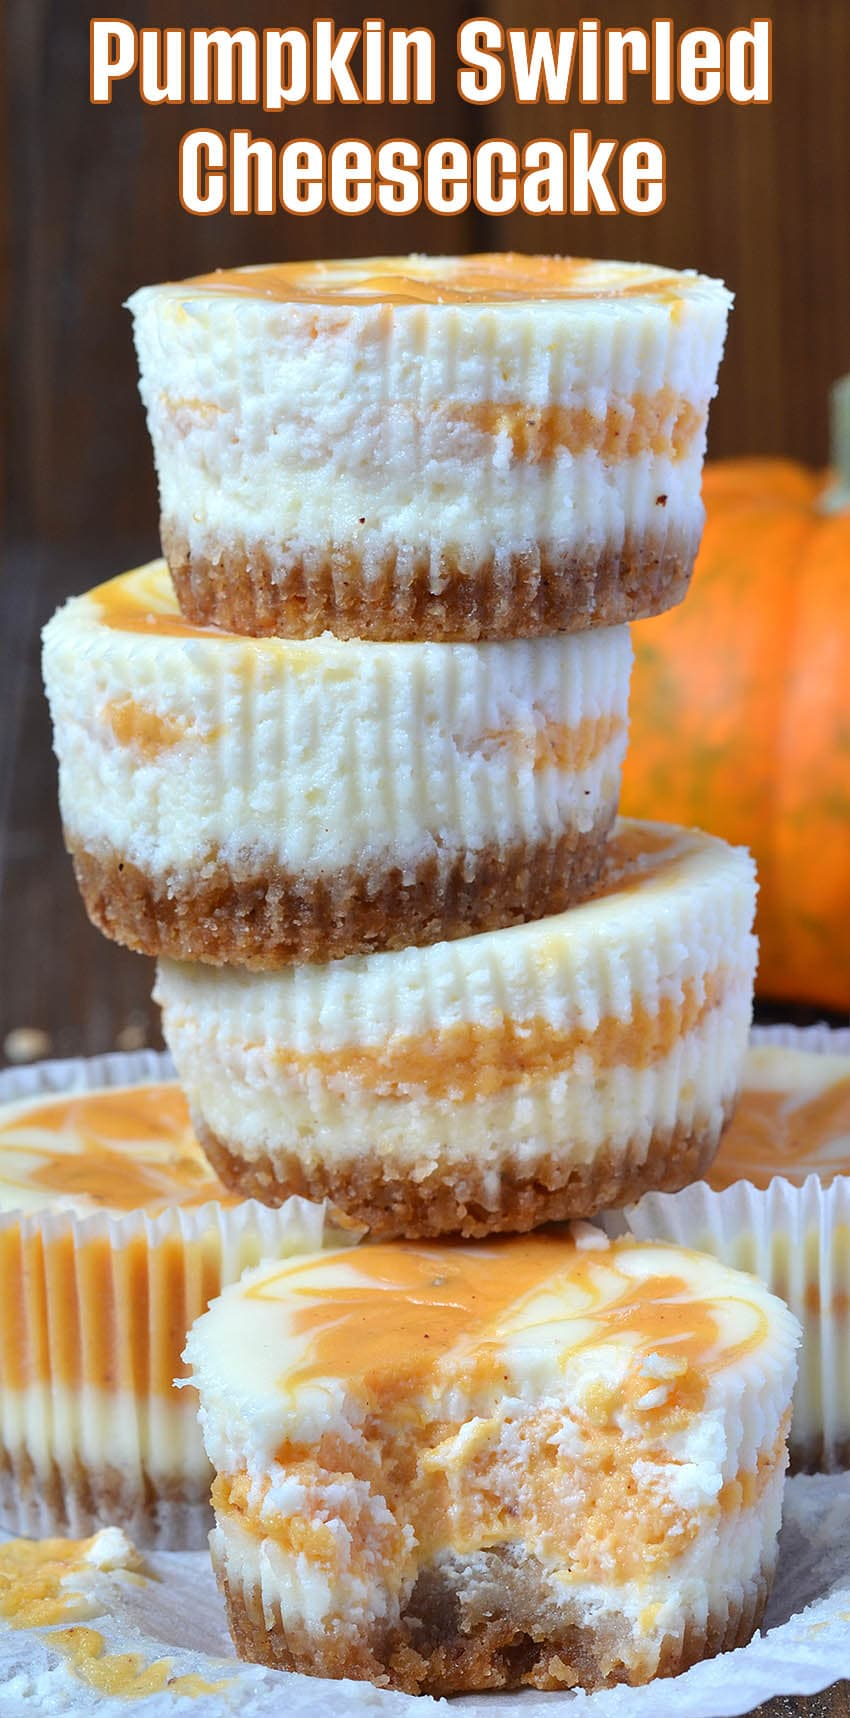 Pumpkin Swirled Cheesecake